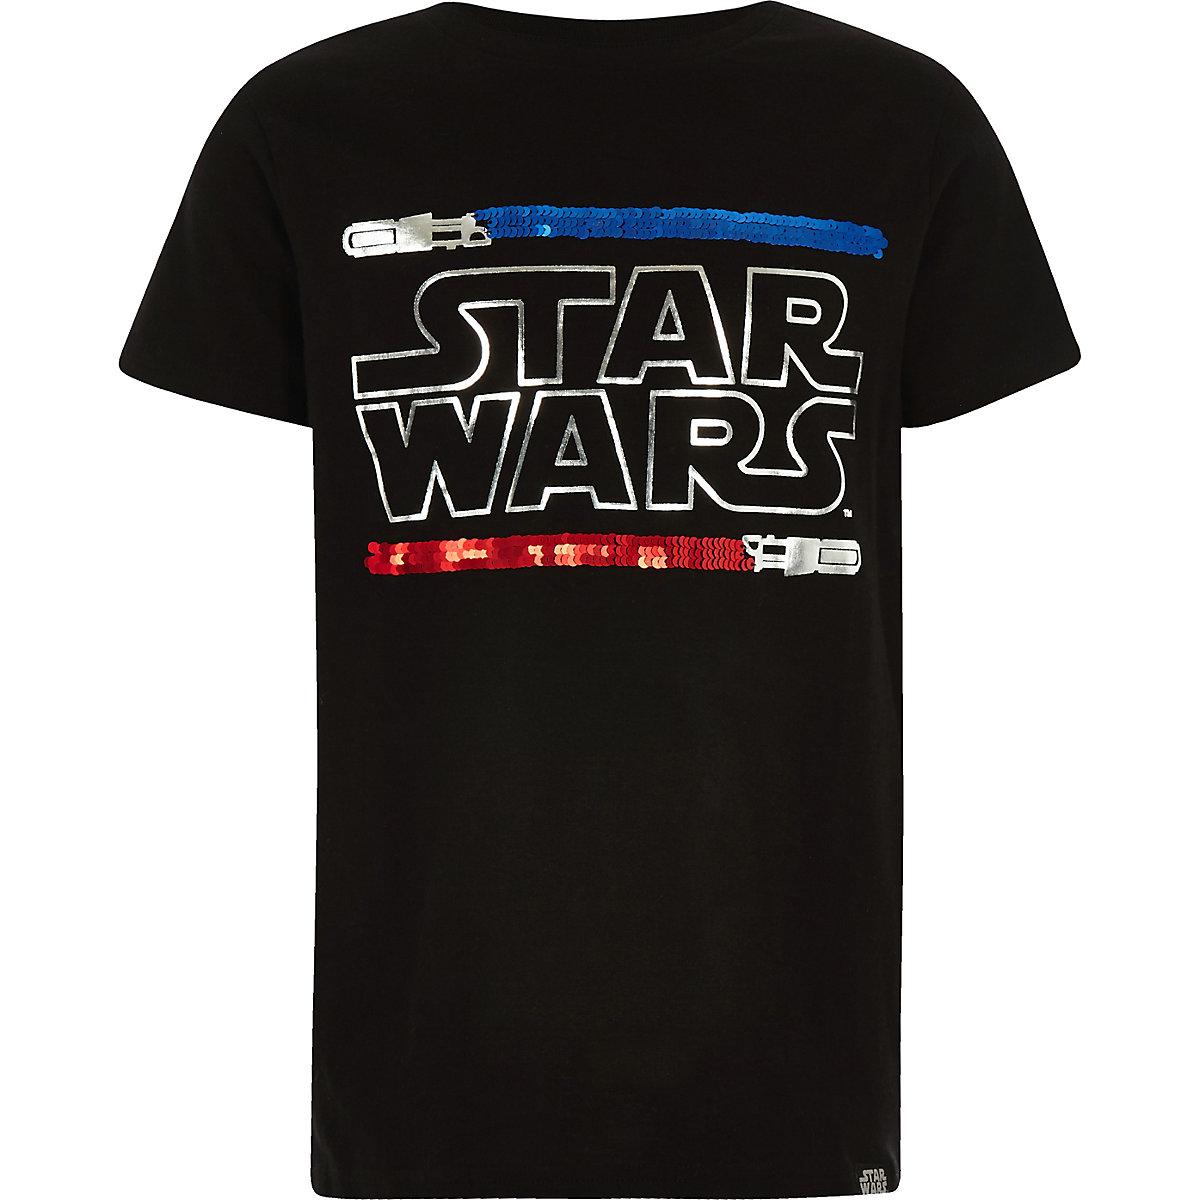 Black Star Wars reverse sequin T-shirt